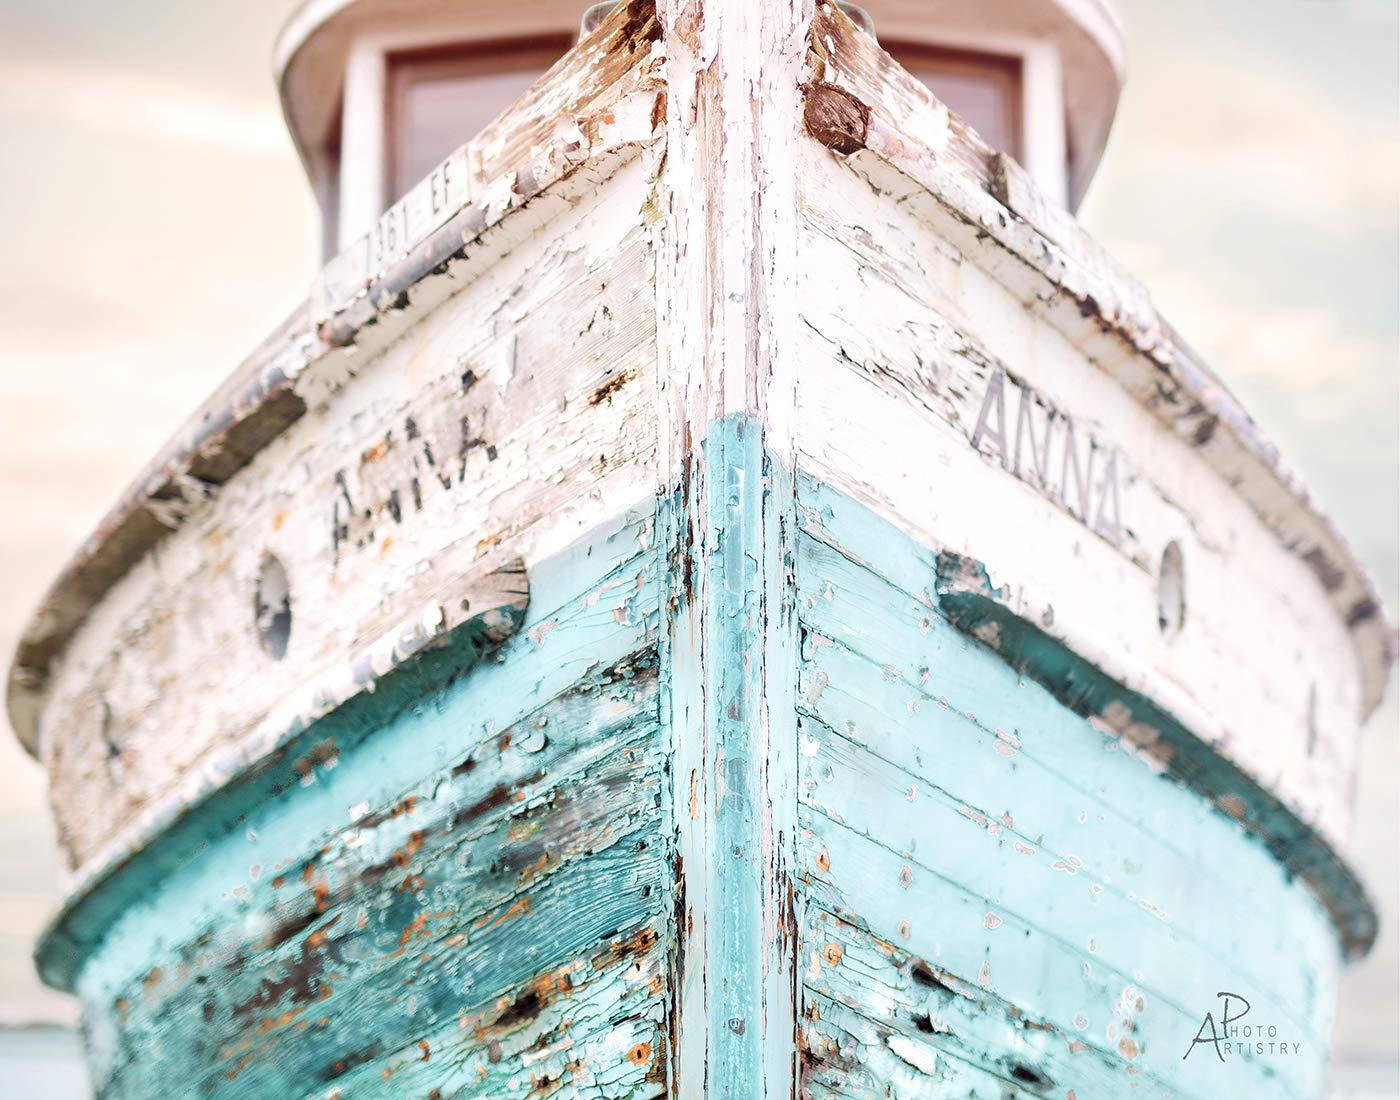 Nautical Ship Image - Fine Art White Photo Translated colors Aqua Branded goods and Off